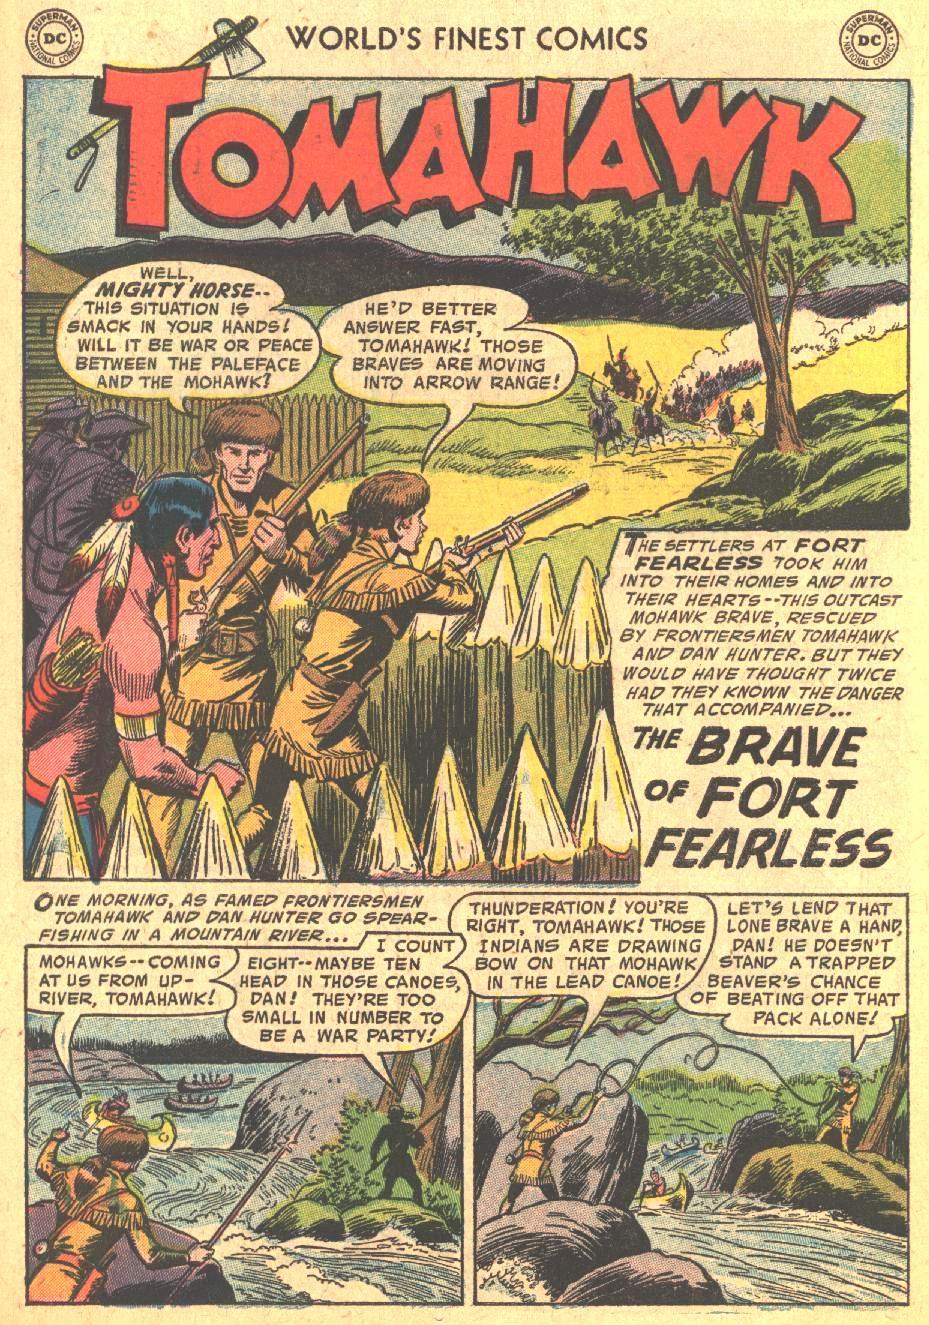 Read online World's Finest Comics comic -  Issue #80 - 28